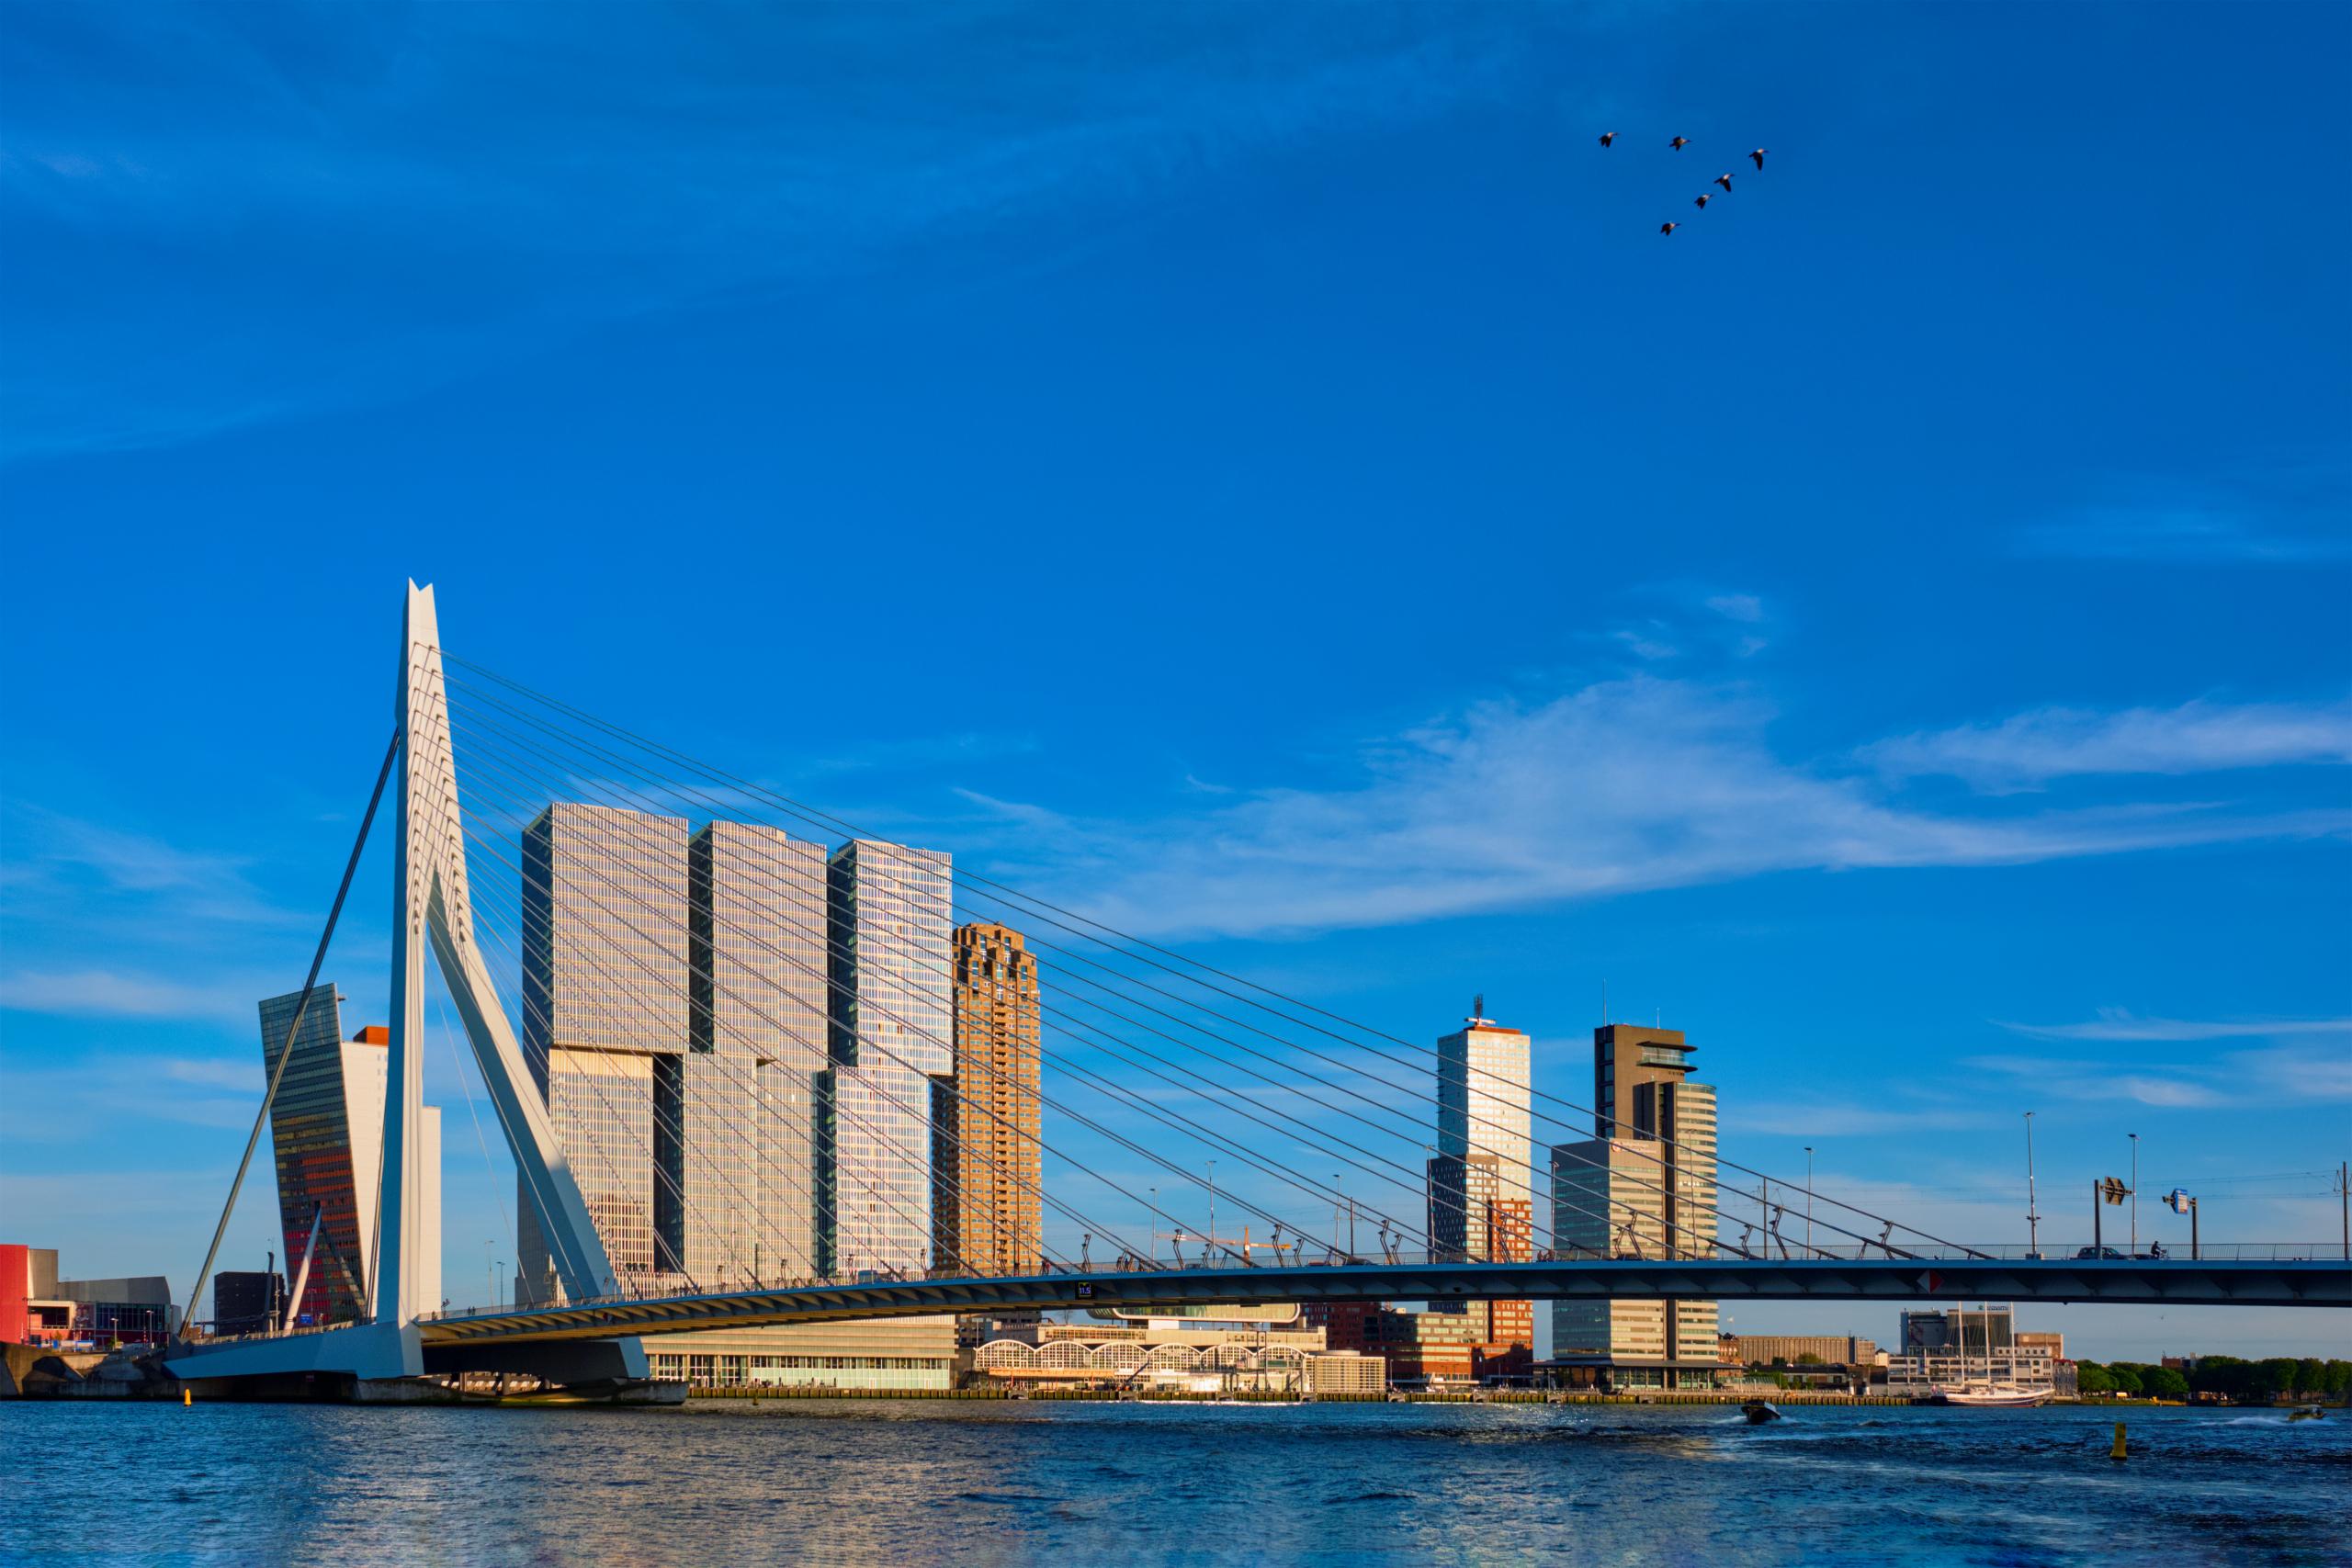 Rotterdam erasmusbrug over de maas